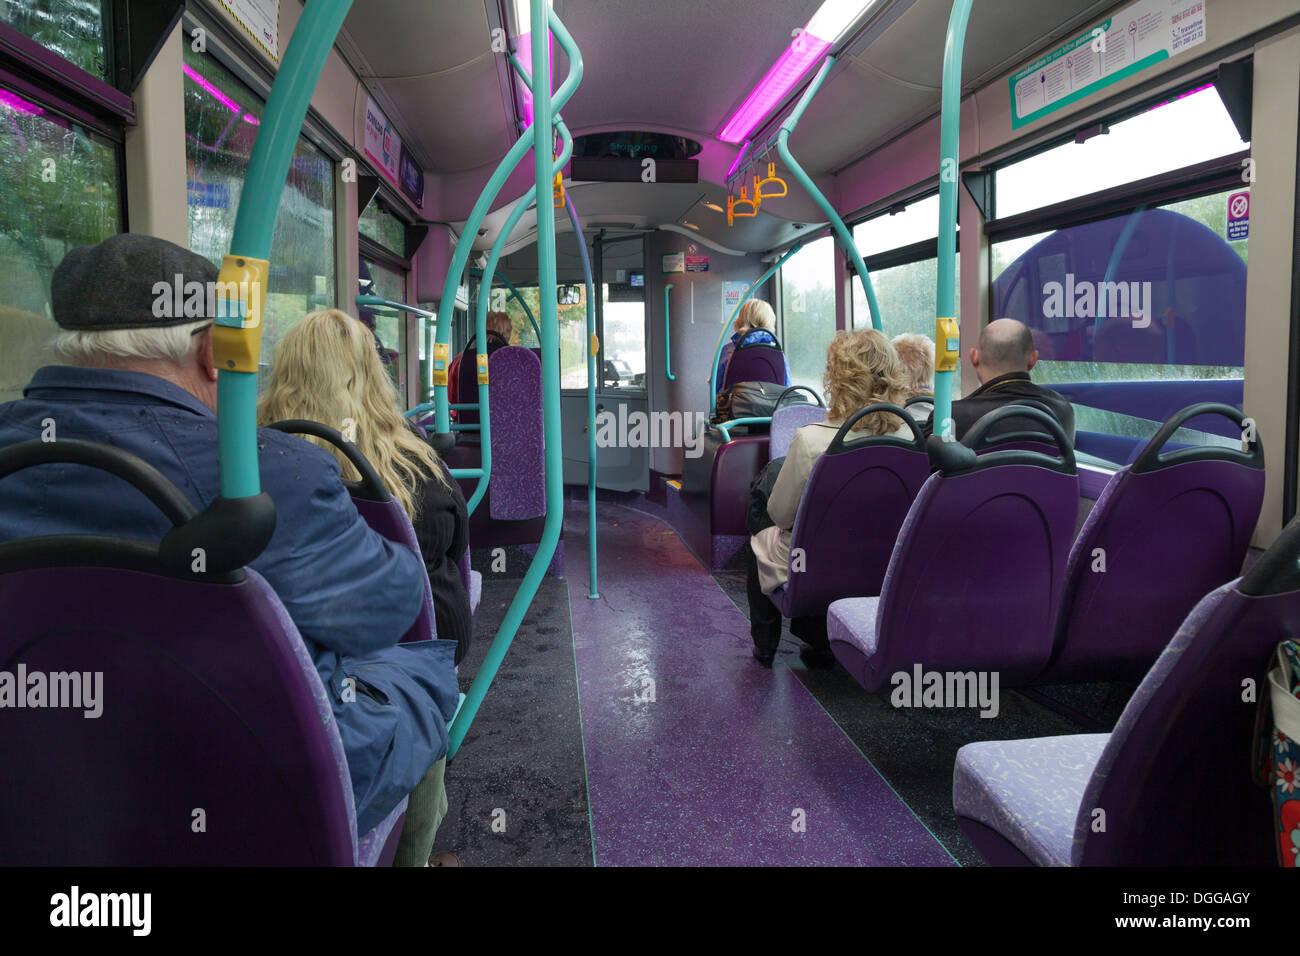 Passengers on single decker public bus. - Stock Image